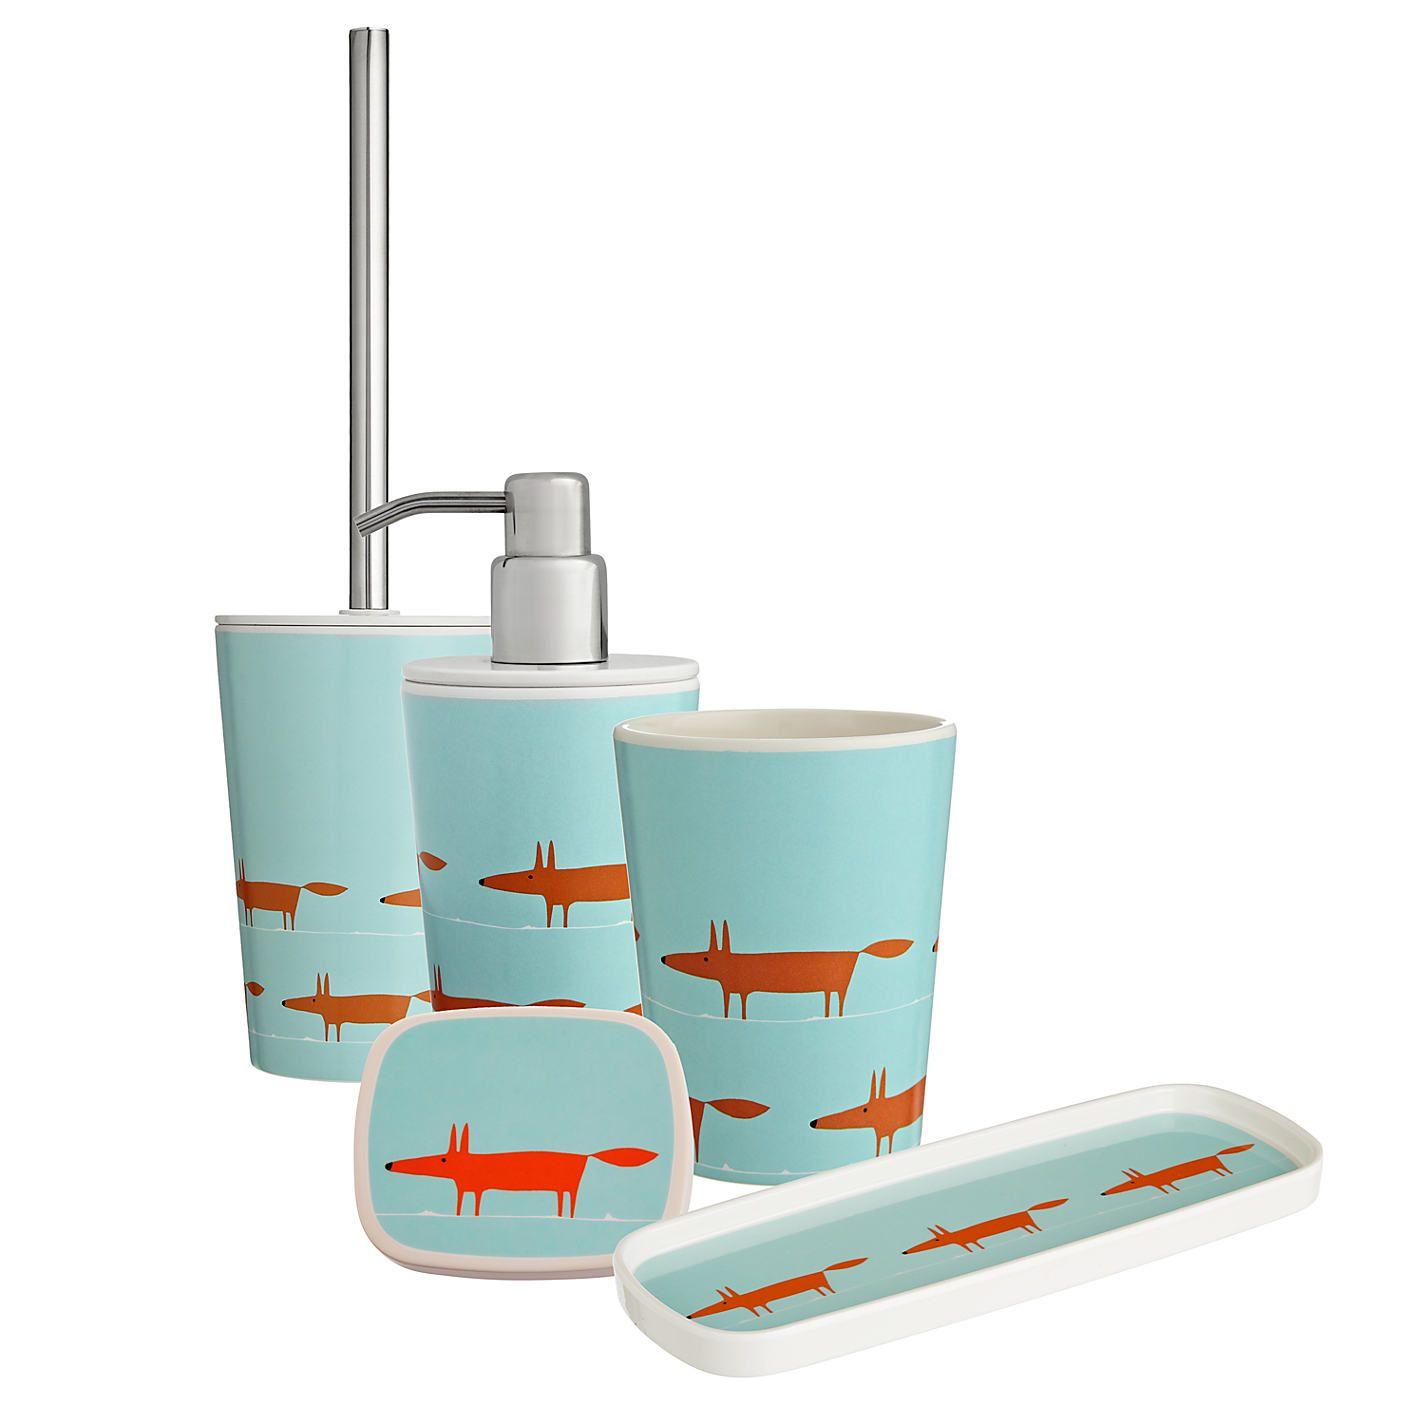 Scion Mr Fox bathroom accessoires | Fox bathroom | Pinterest | Mr ...